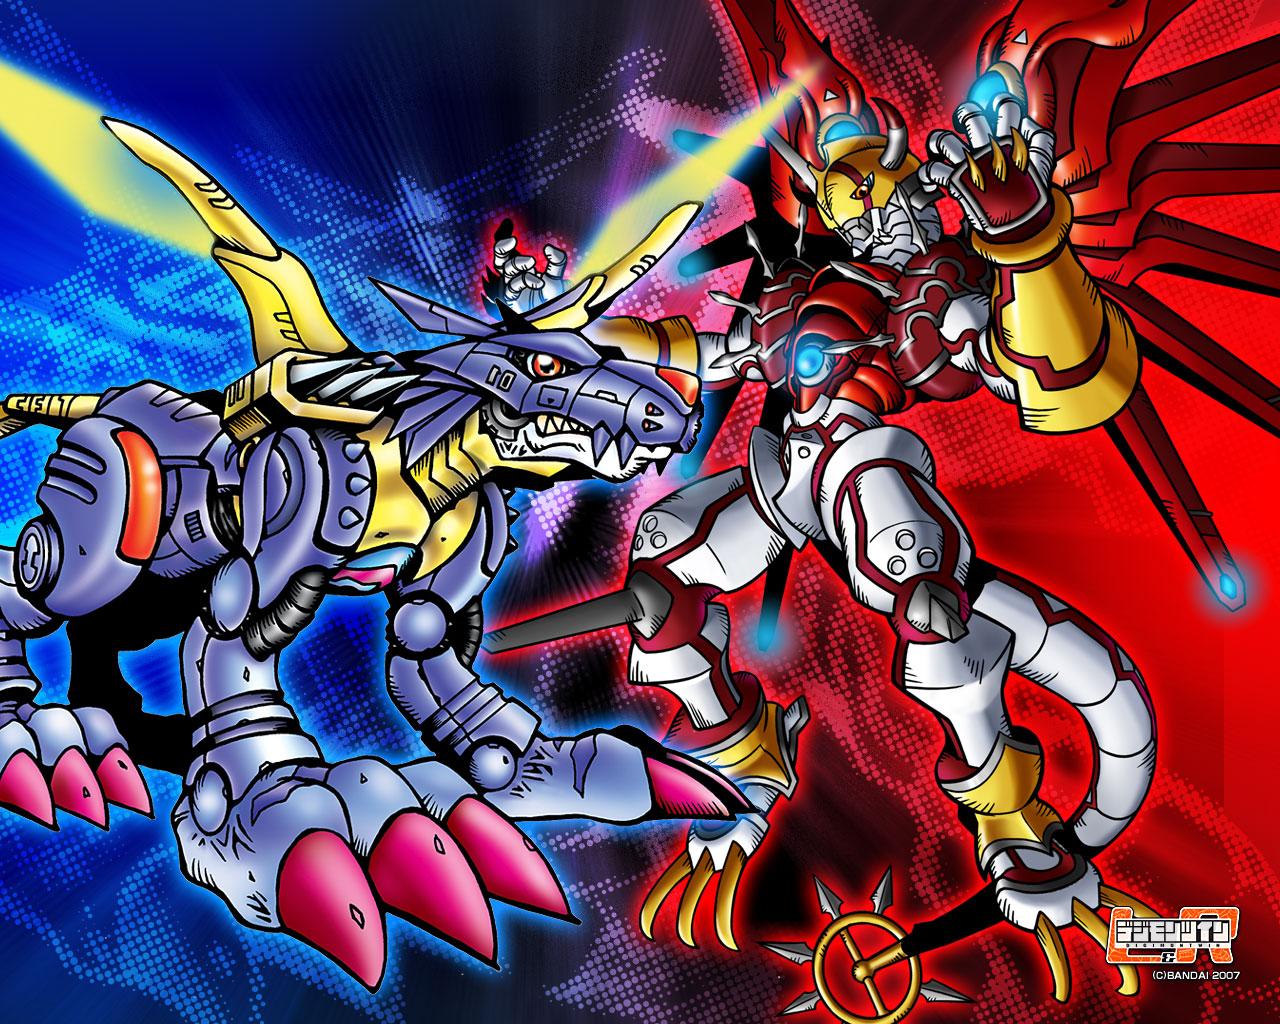 http://4.bp.blogspot.com/-2Eeotc3bo1w/TcR8pytZxHI/AAAAAAAAAwE/Or9TinbWzms/s1600/Digimon+Wallpaper+2.jpg